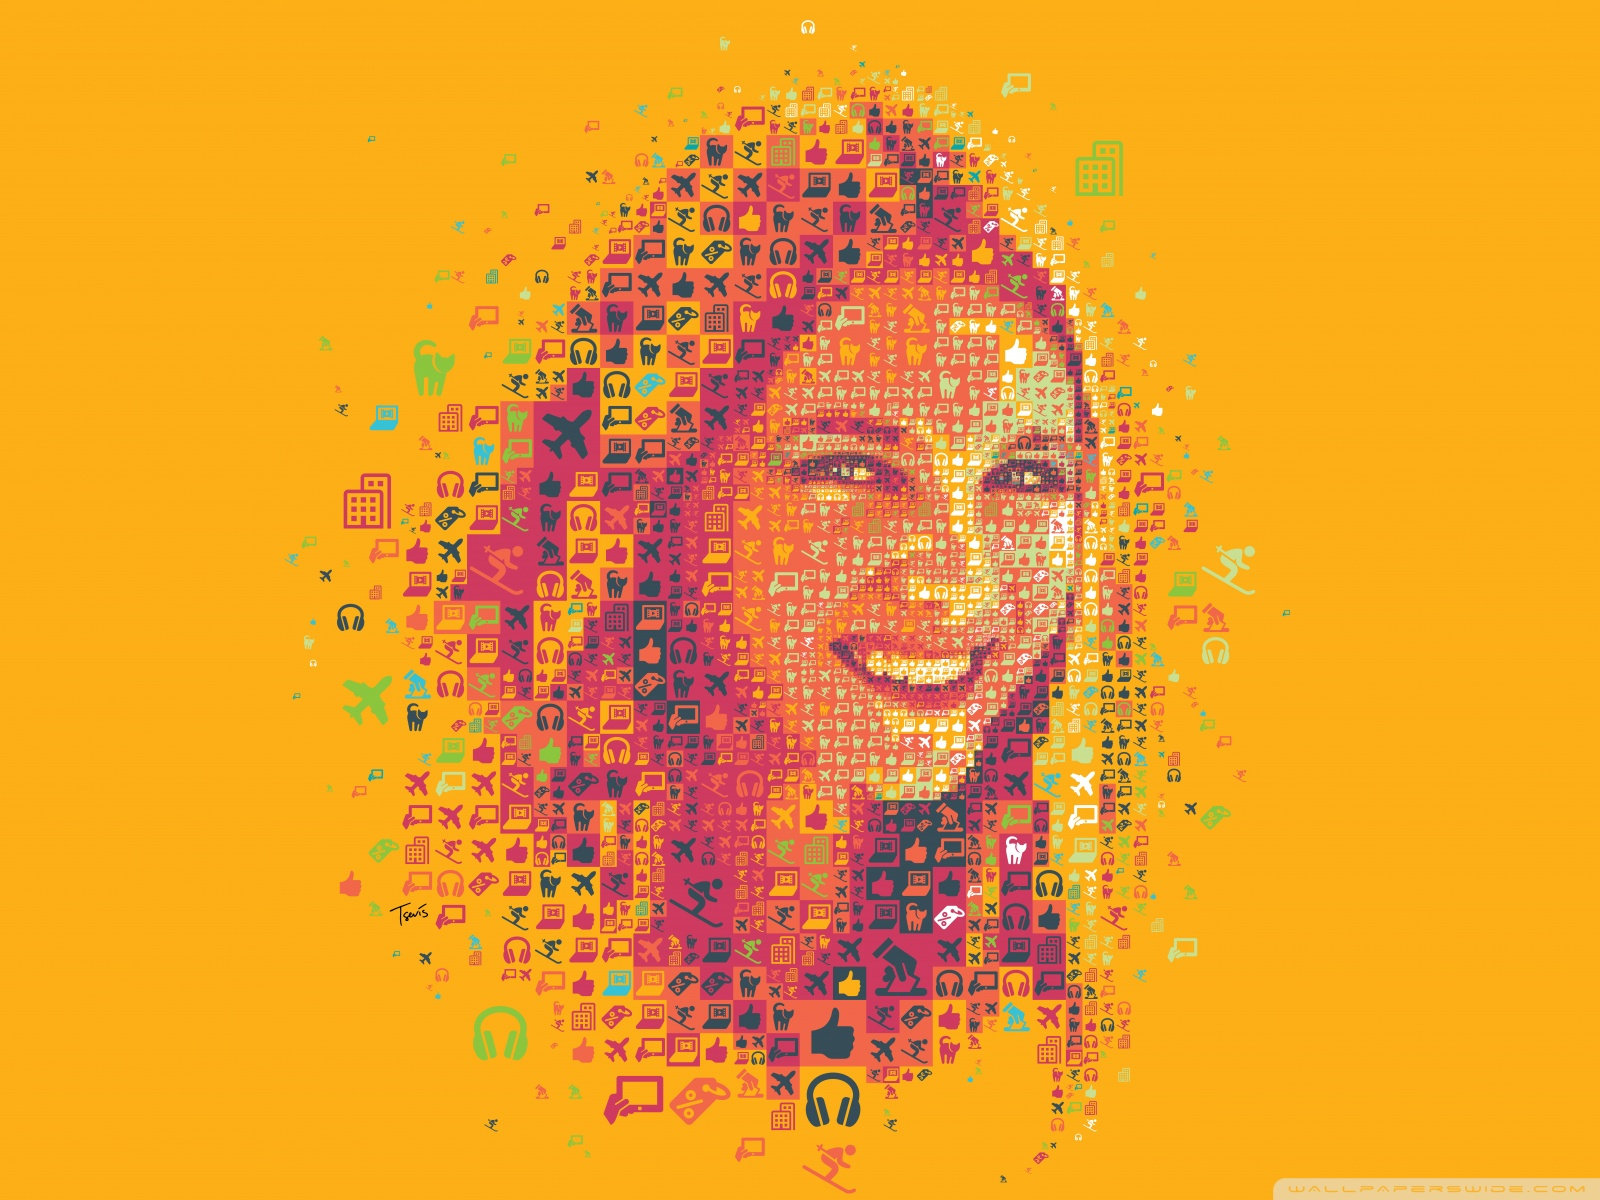 Free Digital Art phone wallpaper by lmurri